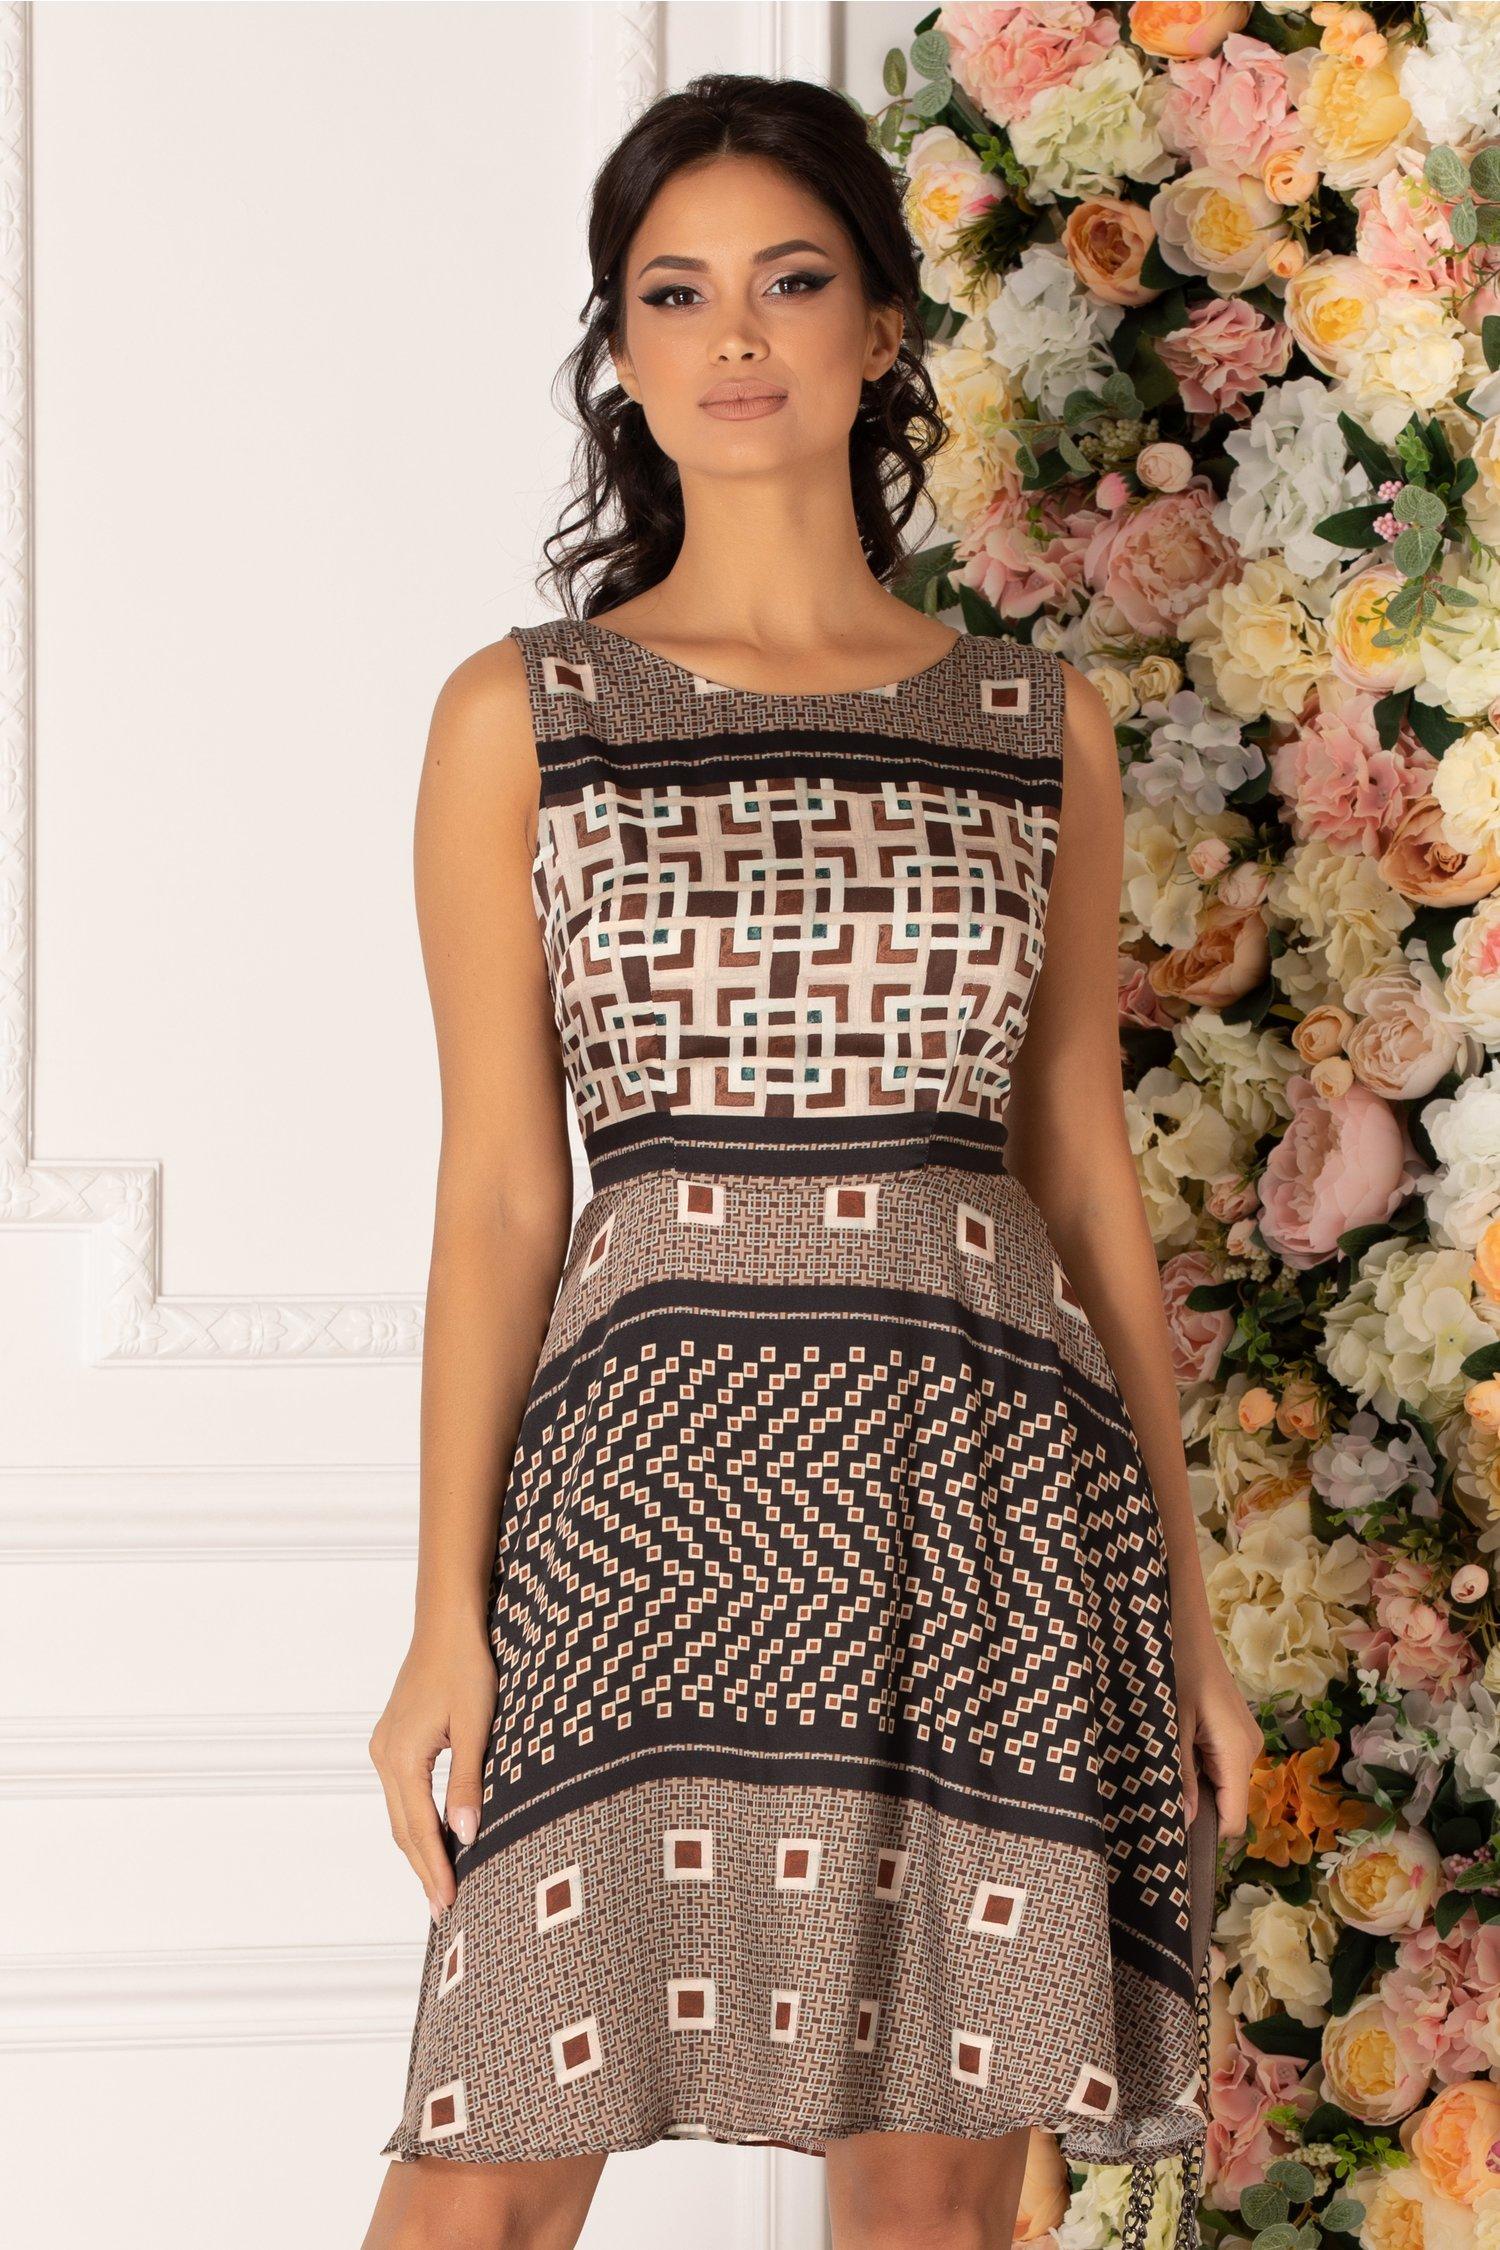 Rochie Crissa maro cu imprimeuri geometrice